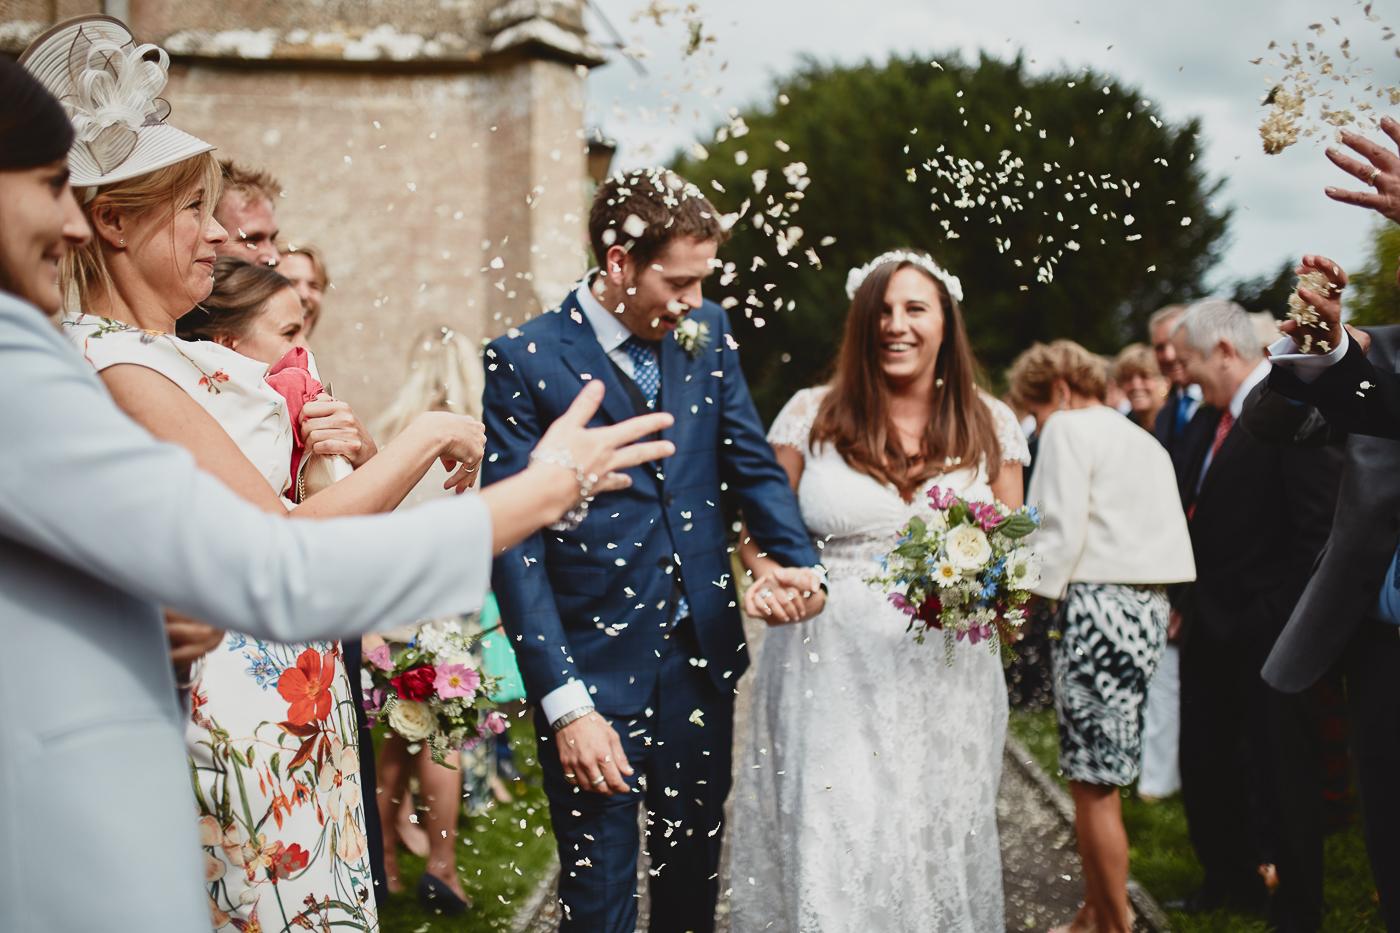 Danni_And_Jack_Gloucester_Wedding-77.jpg